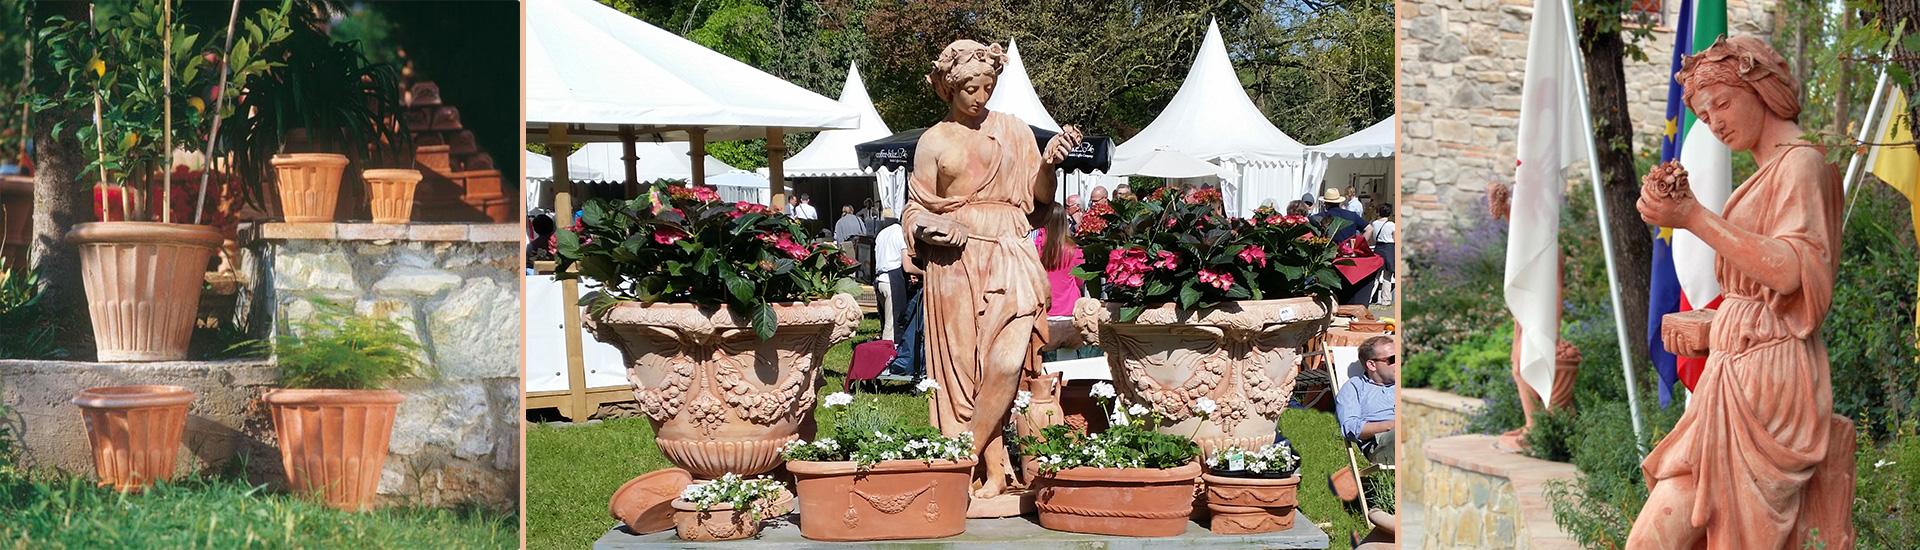 Impruneta Terracotta aus der sonnigen Toskana, Vertrieb Dieter Wetter